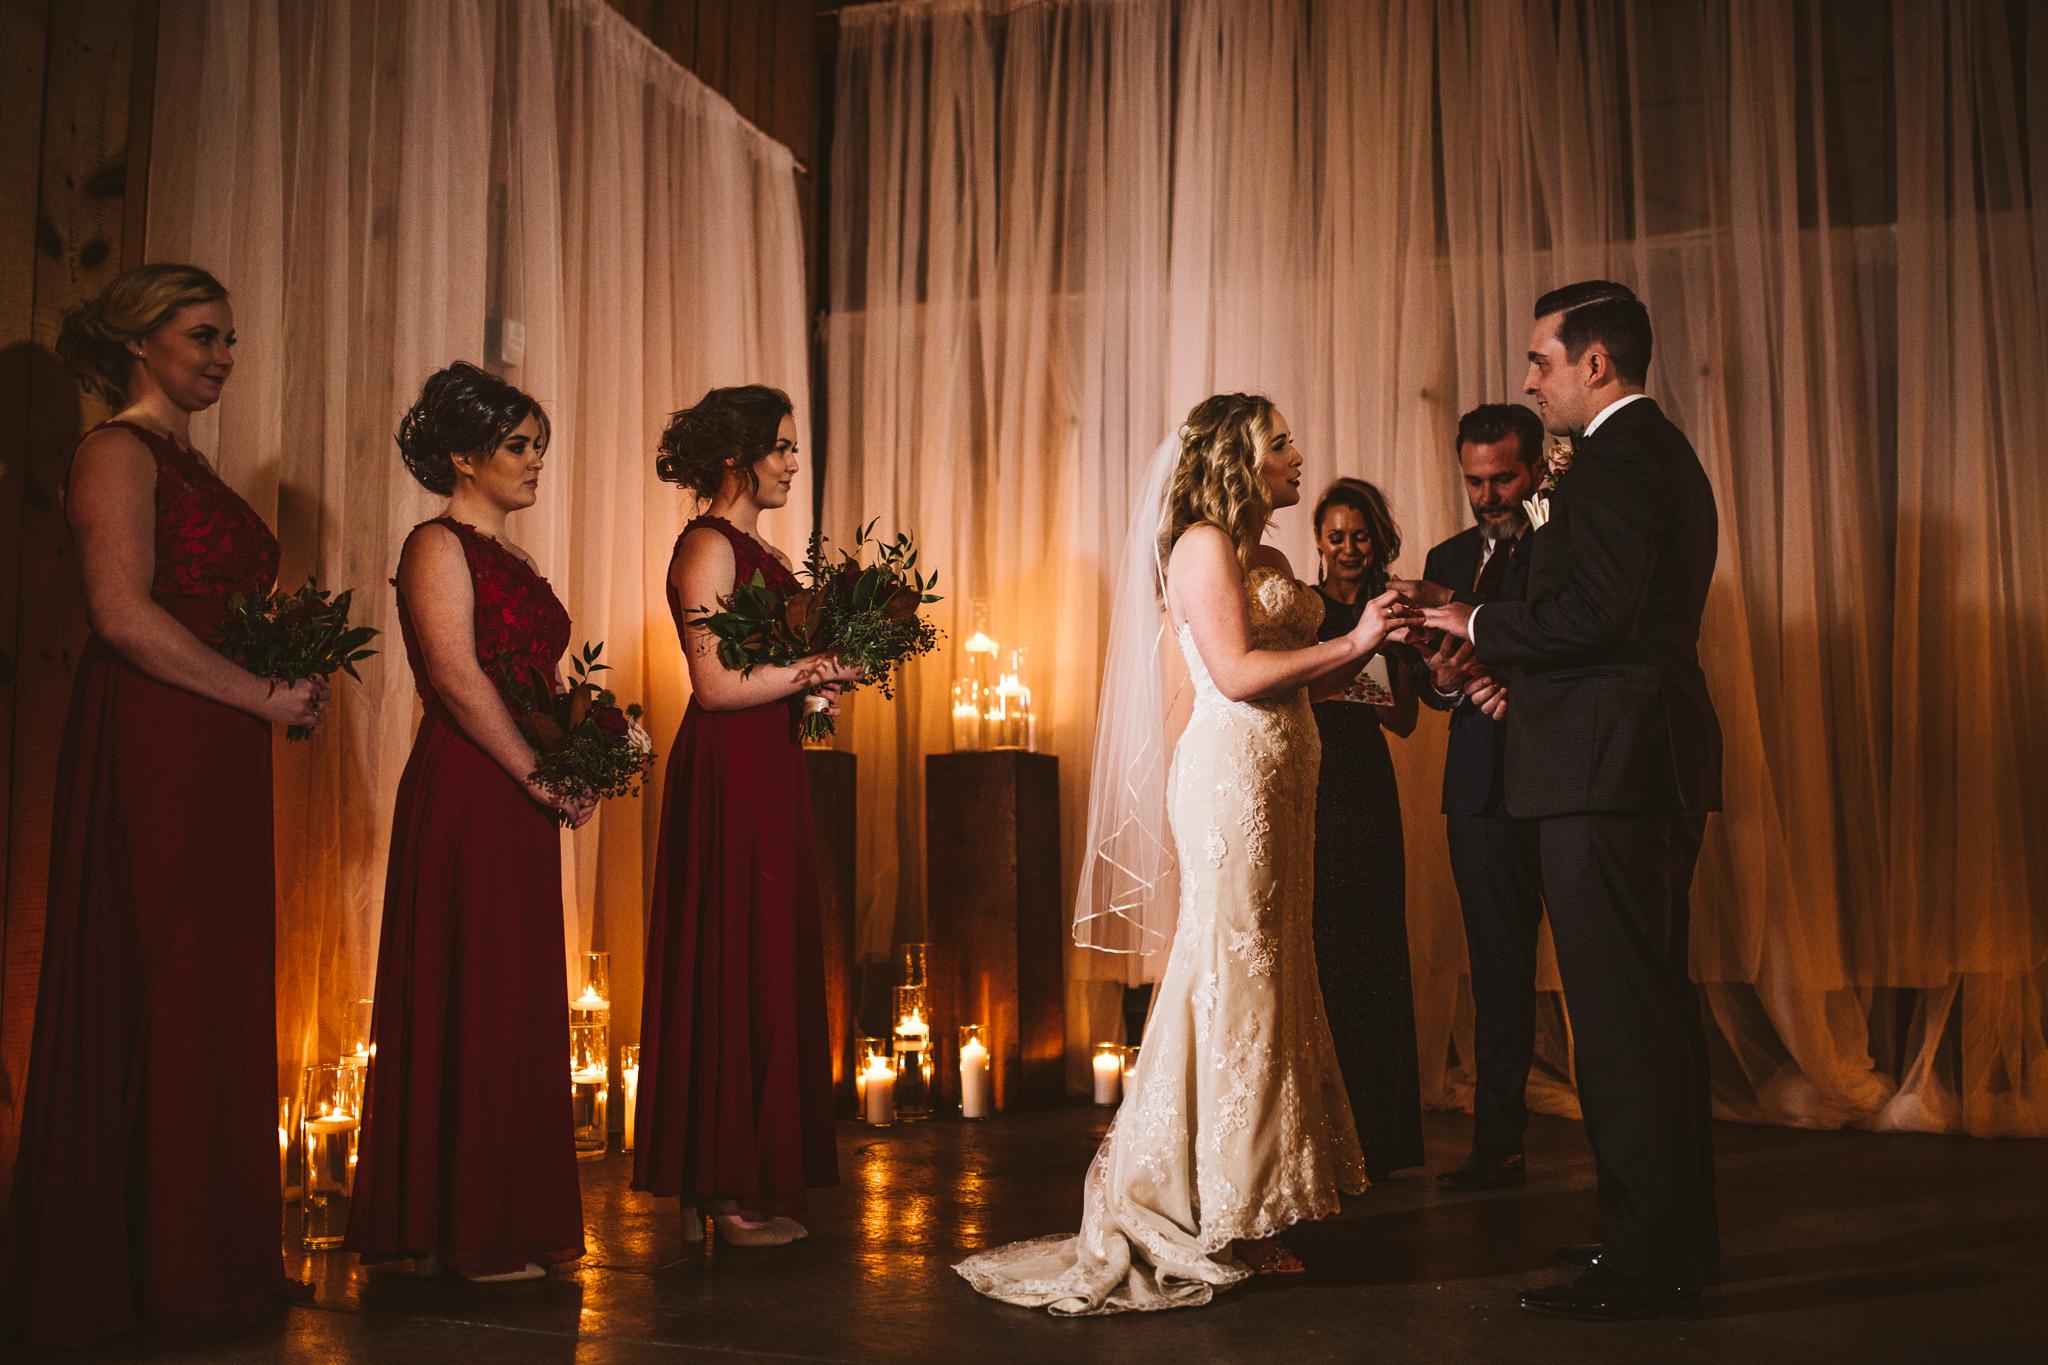 0123 Ariana Jordan Photo - Cameron & Lauren's Wedding at Talon Winery  7067.jpg